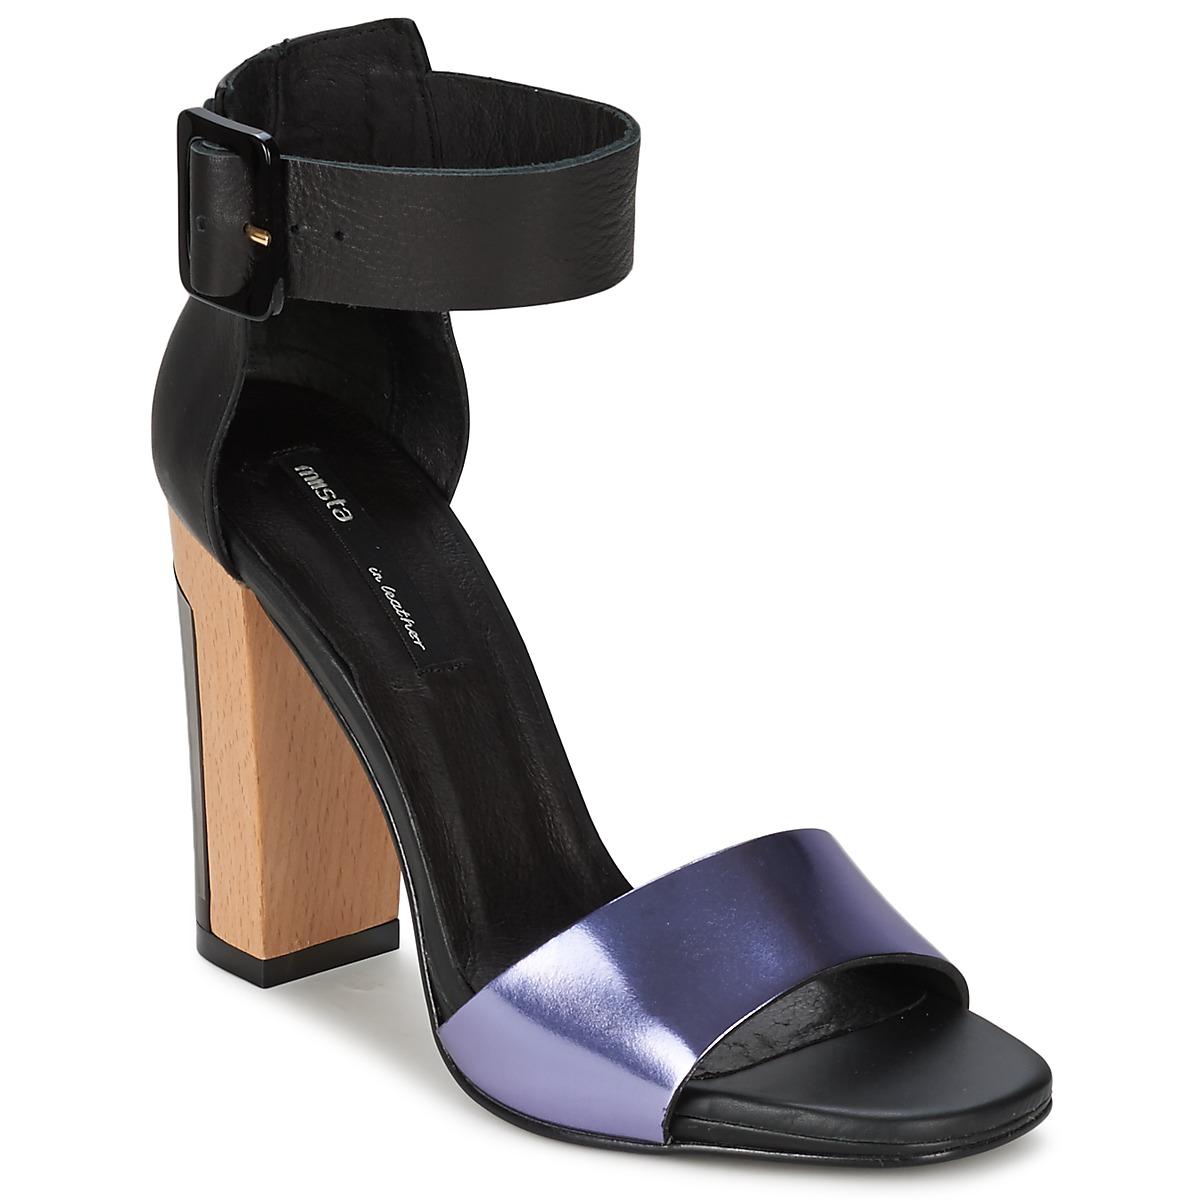 Sandale Miista LILY Noir / Lavande